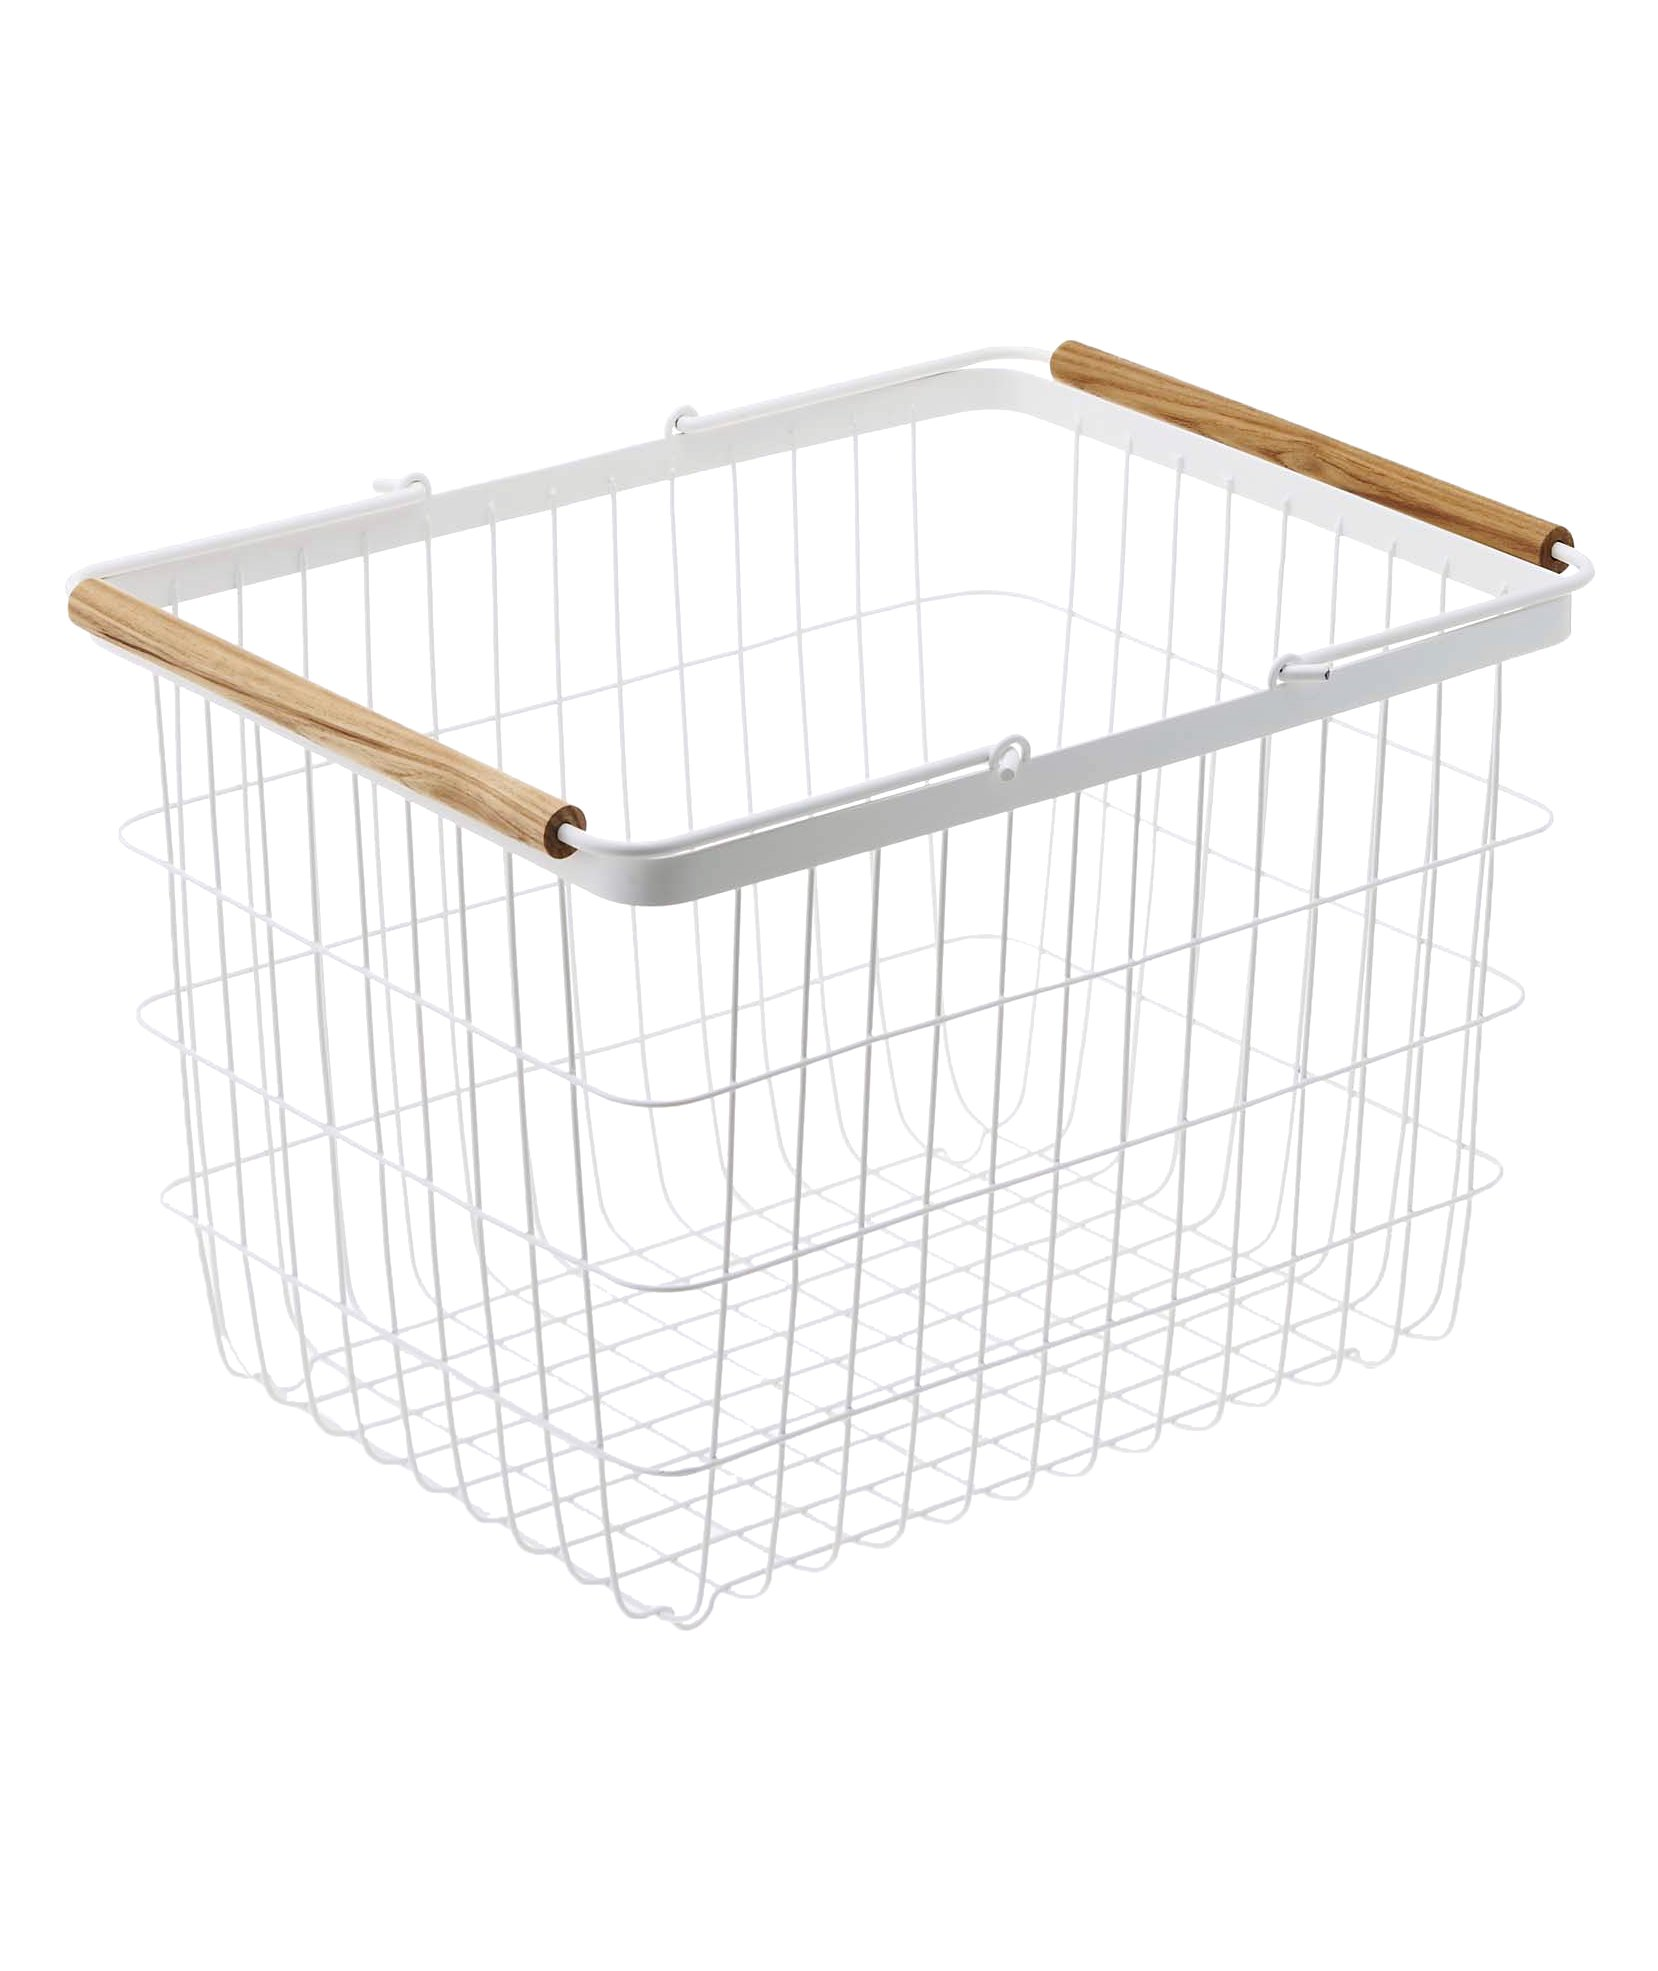 "Tosca Laundry Basket Size: 10.6"" H x 16.3"" W x 12.2"" D"